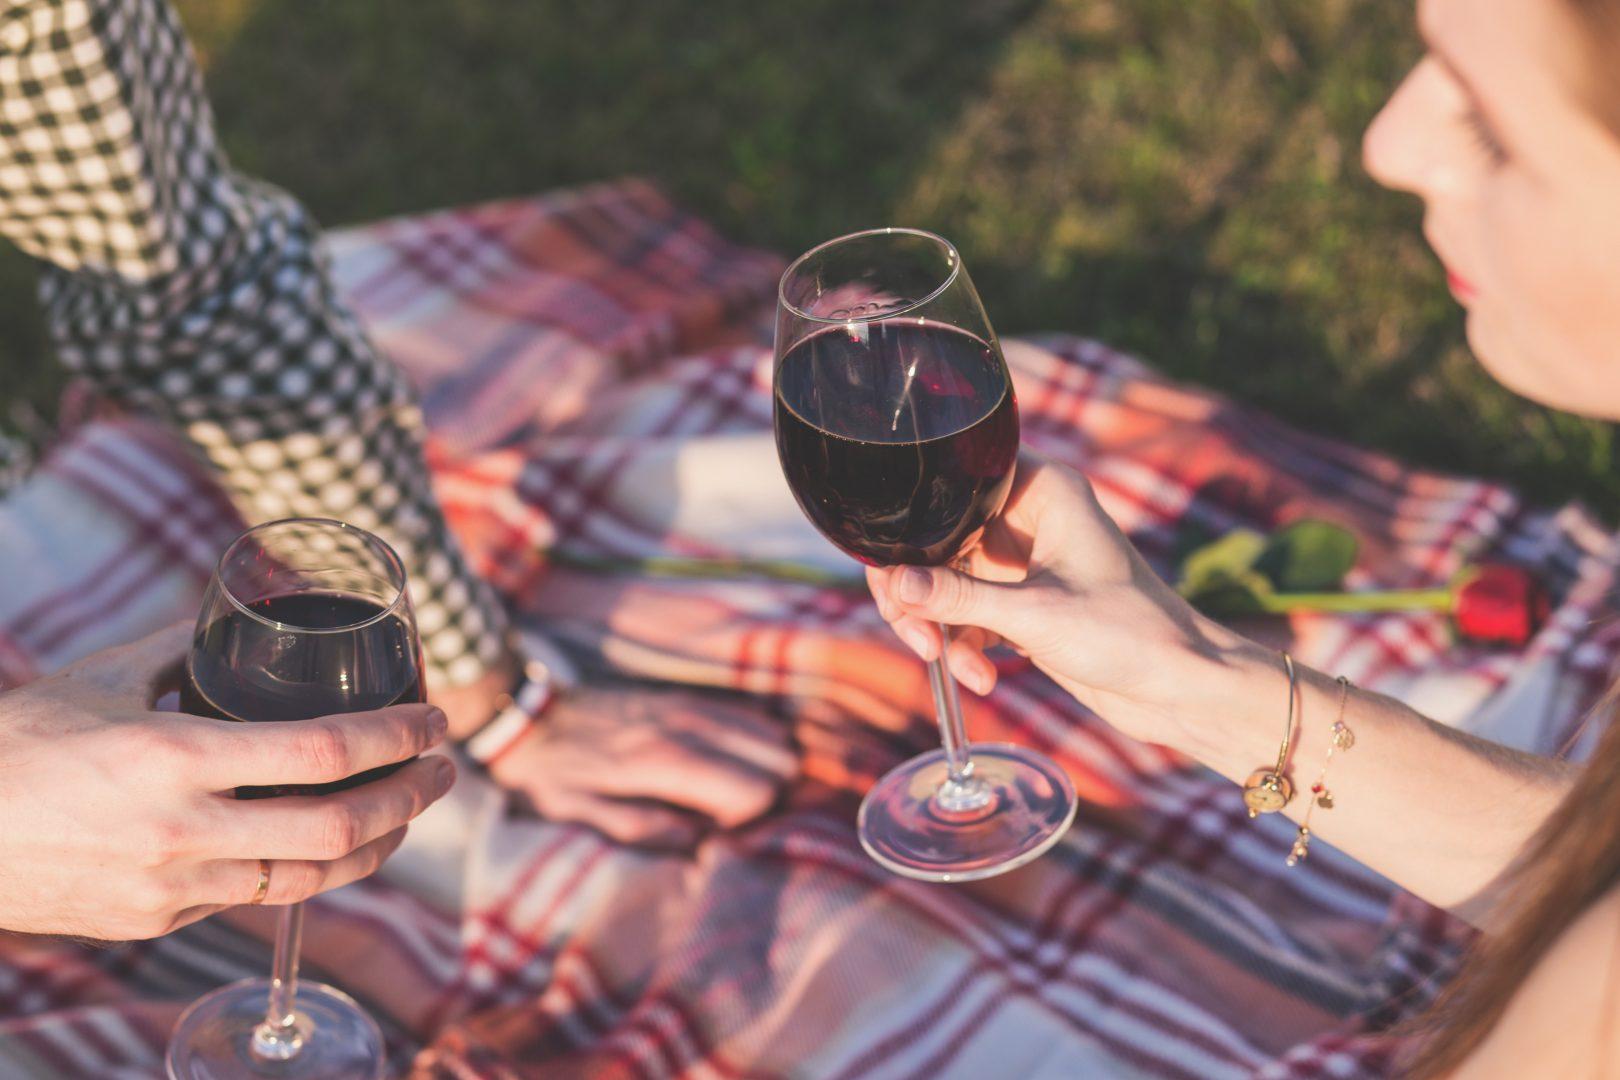 alcohol-blanket-celebration-160322